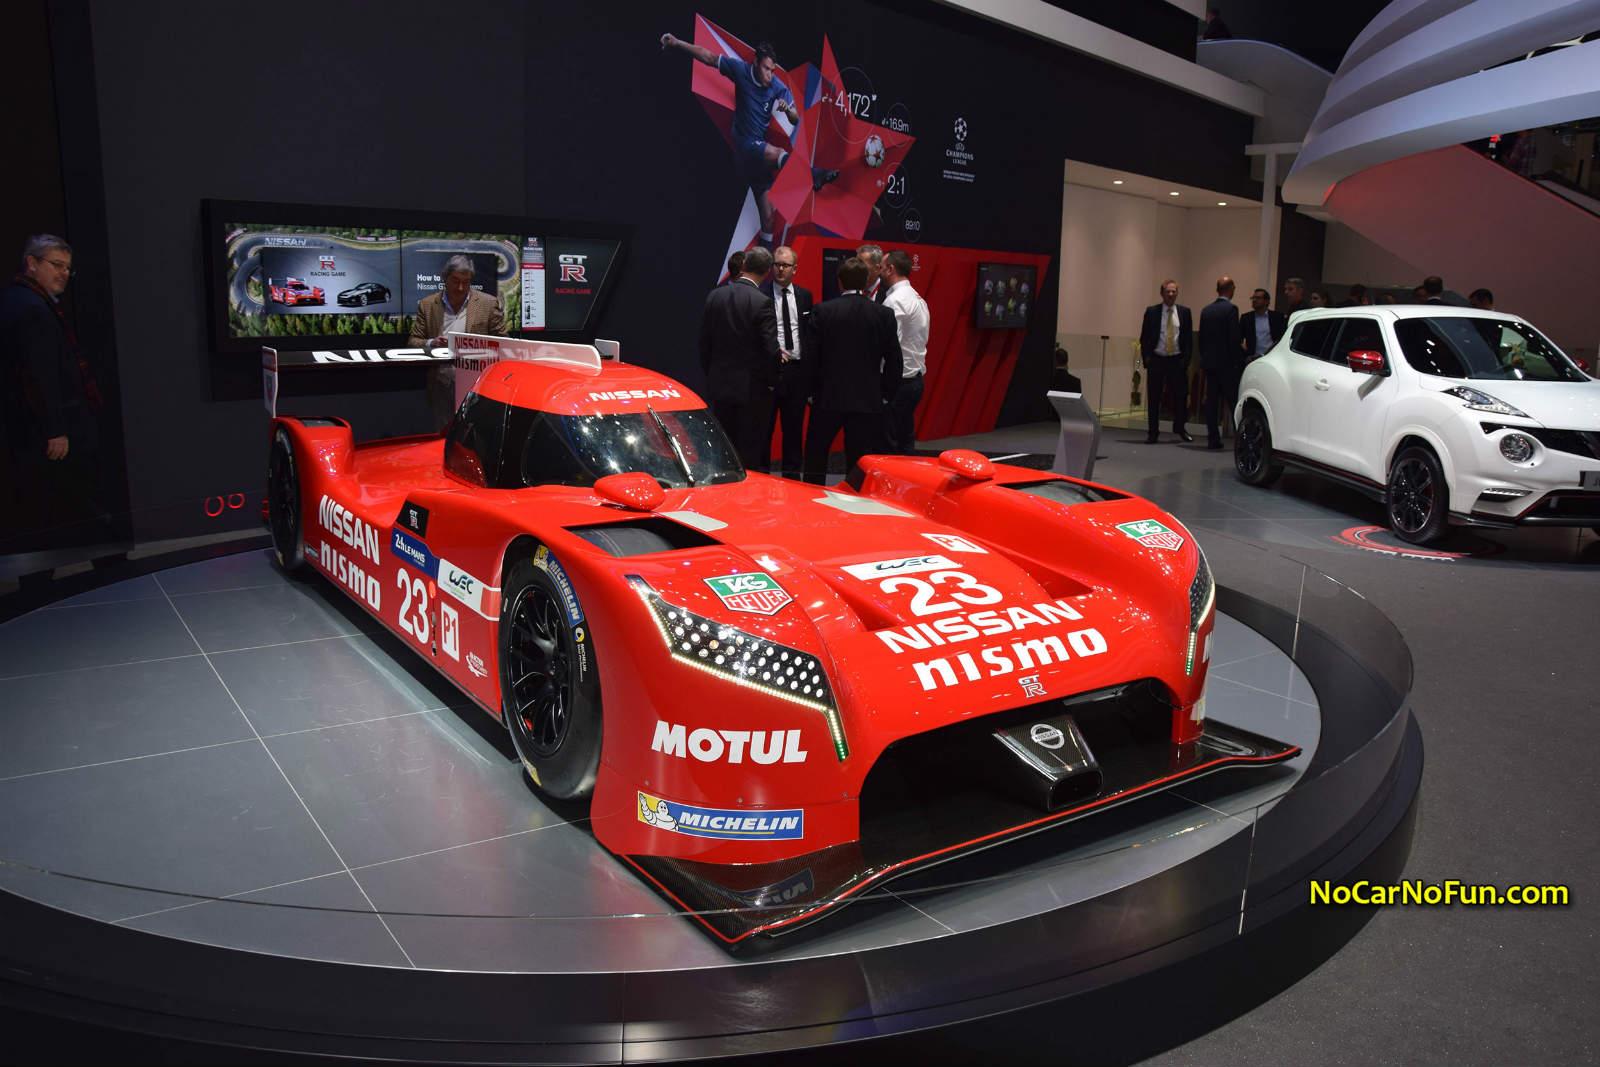 2015 Nissan Gt R Lm Nismo 1250 Hp 02 2015 Geneva Motor